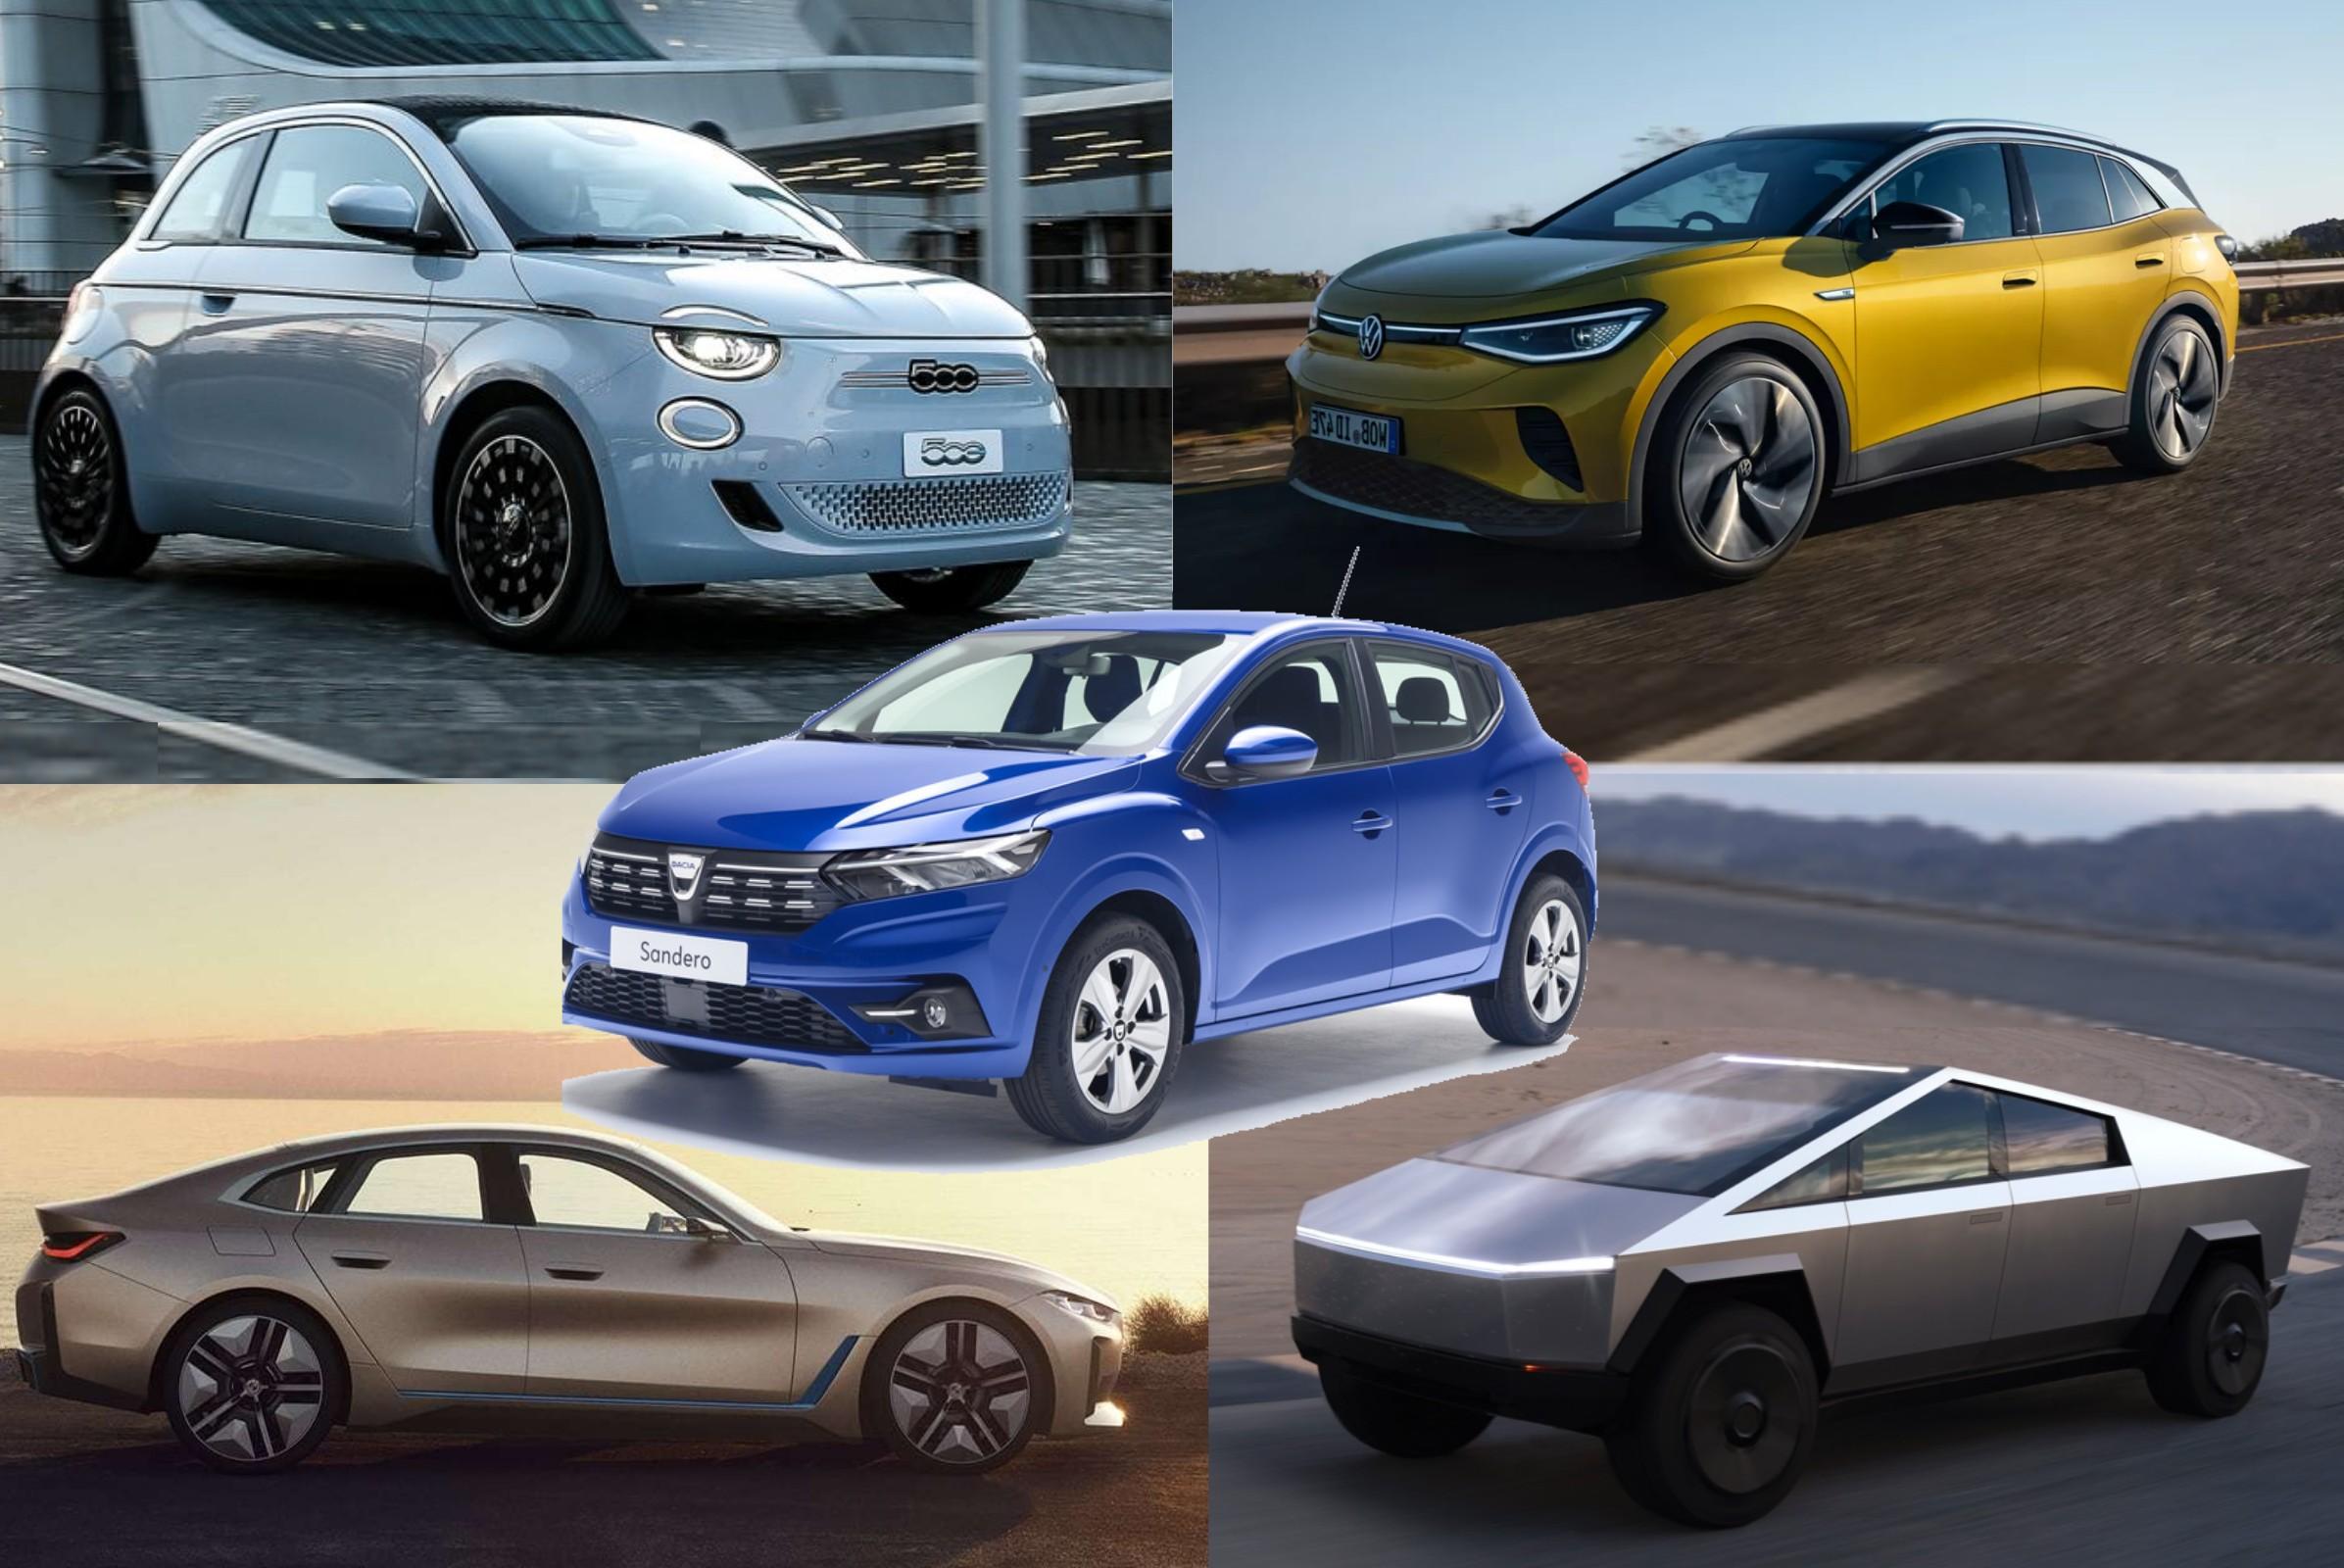 new cars 2021 article.jpg (570 KB)